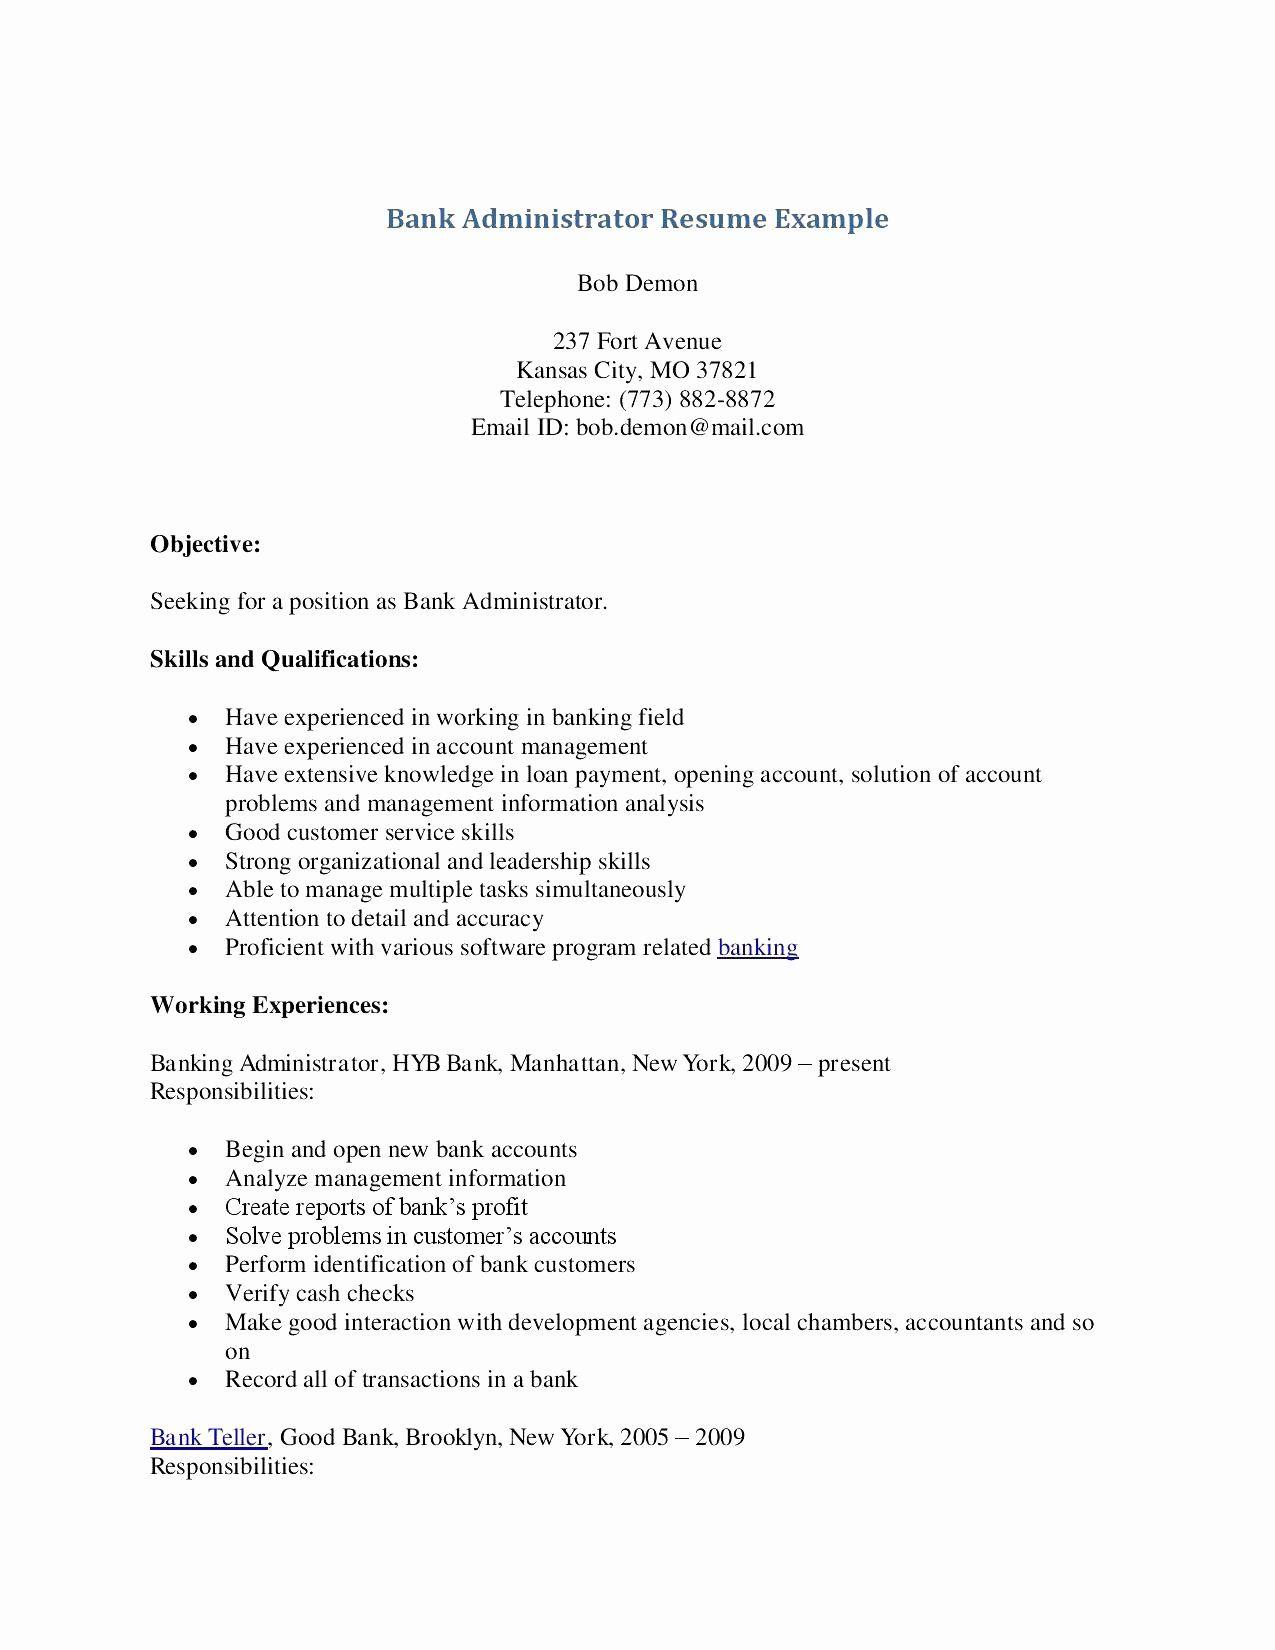 Bank teller responsibilities resume inspirational 12 13